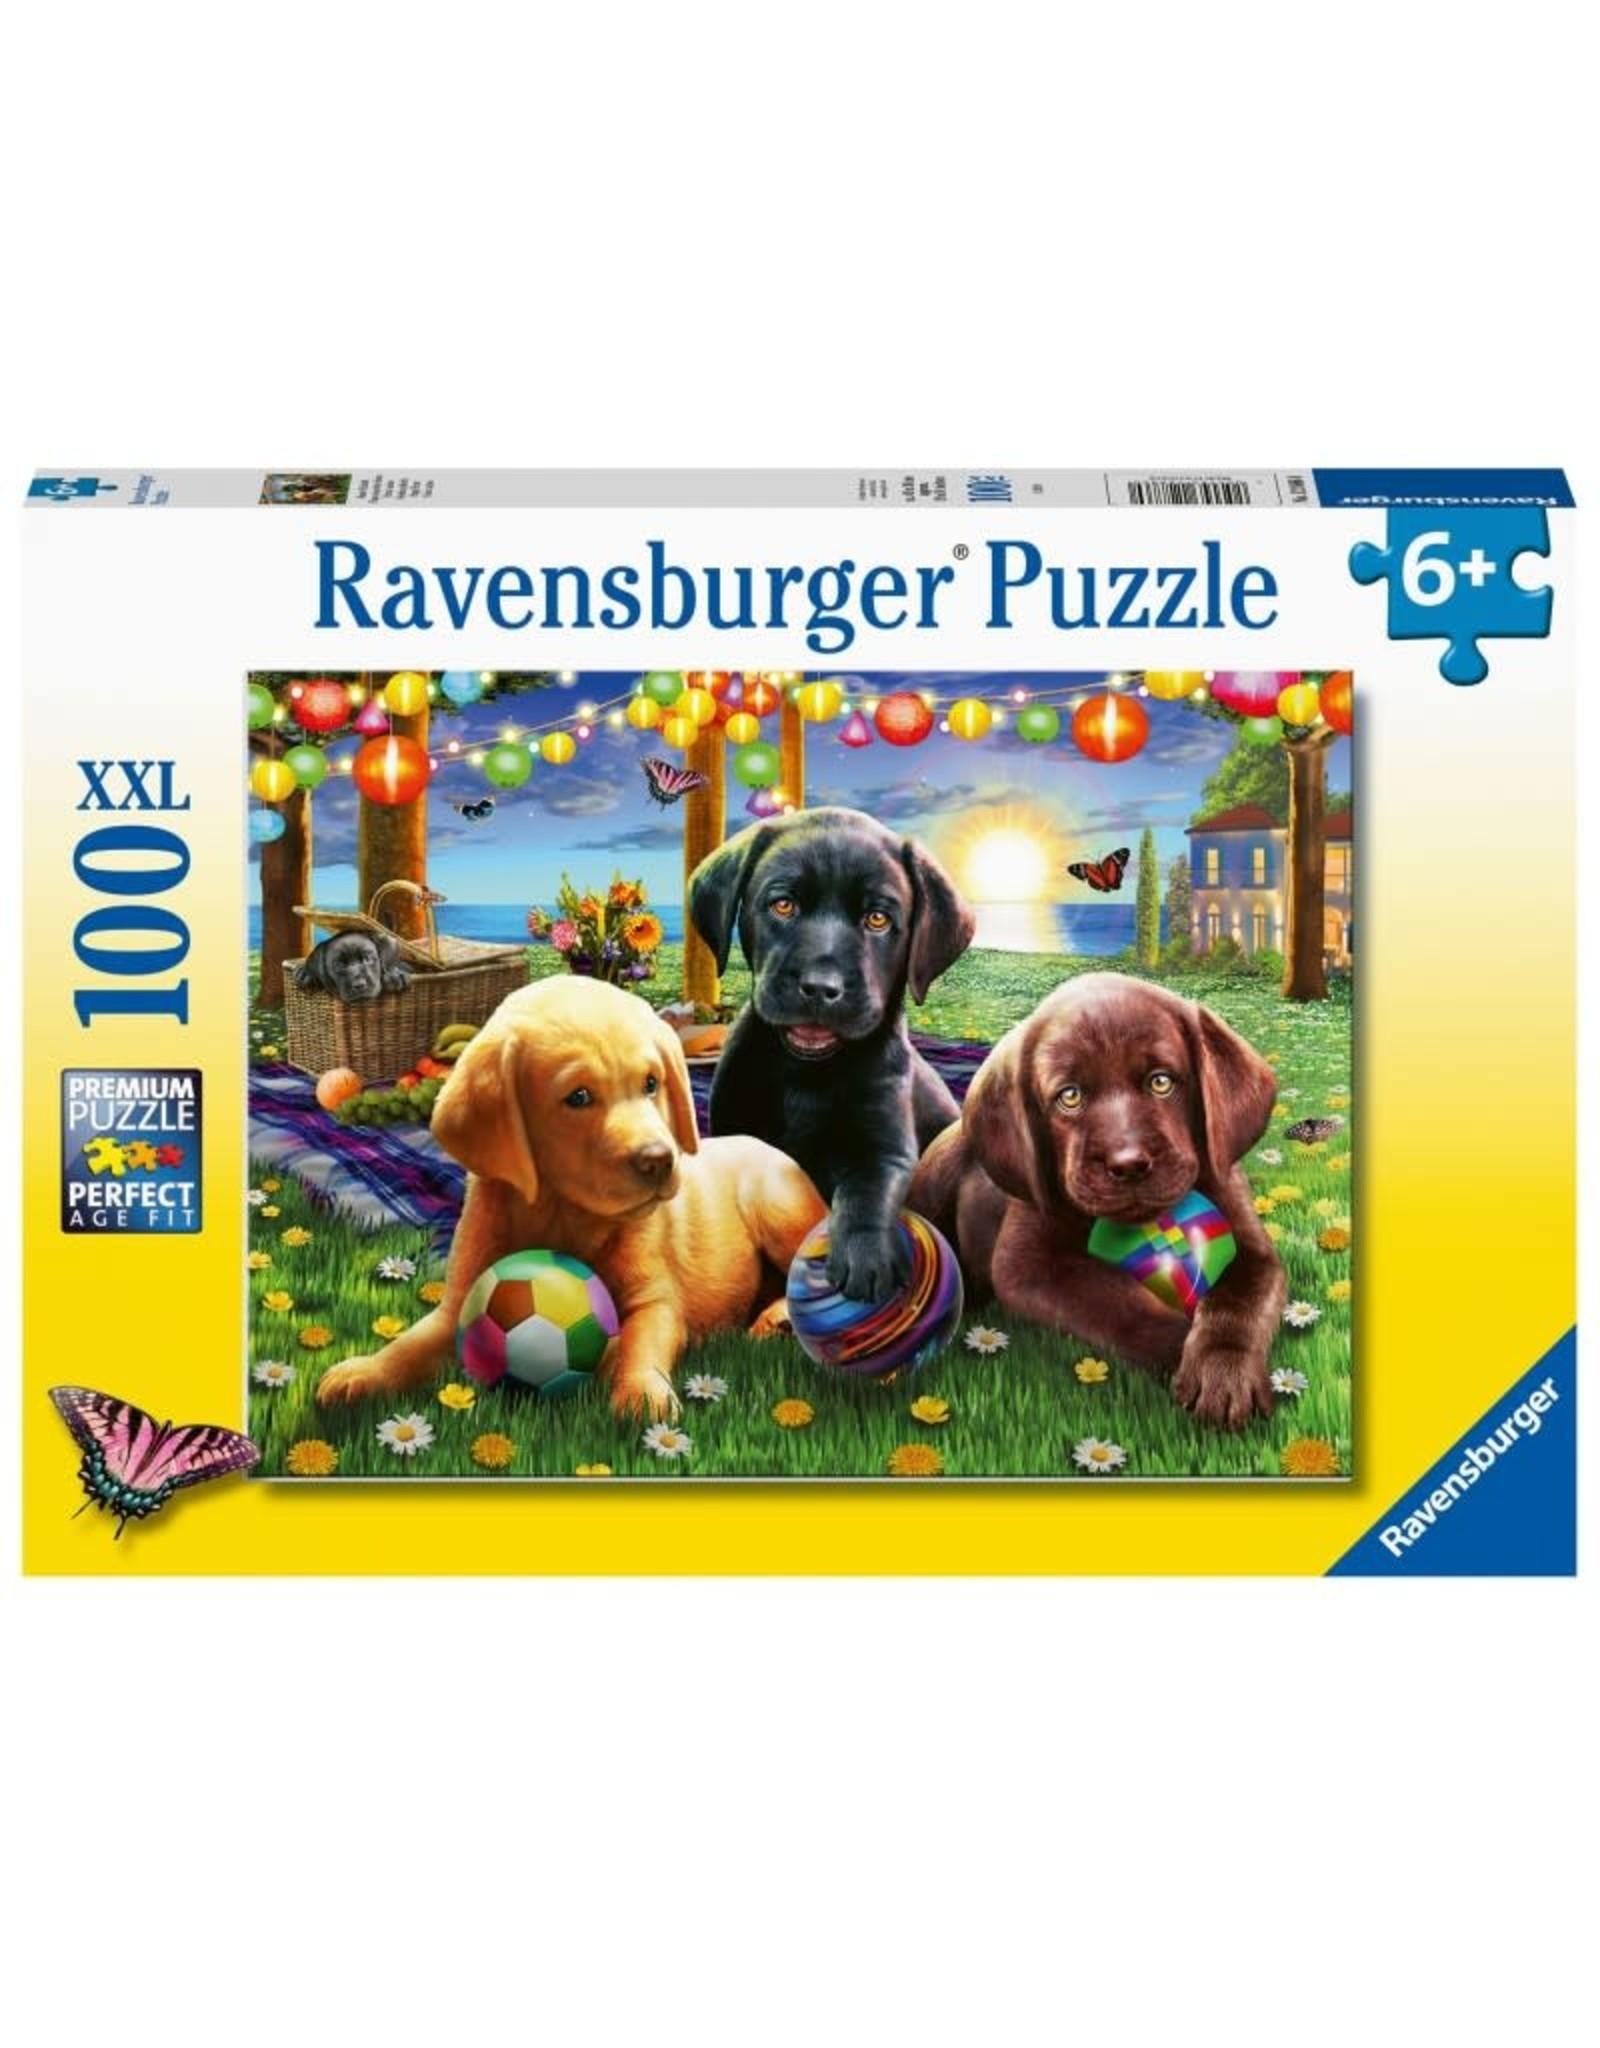 Ravensburger Puppy Picnic 100 pc